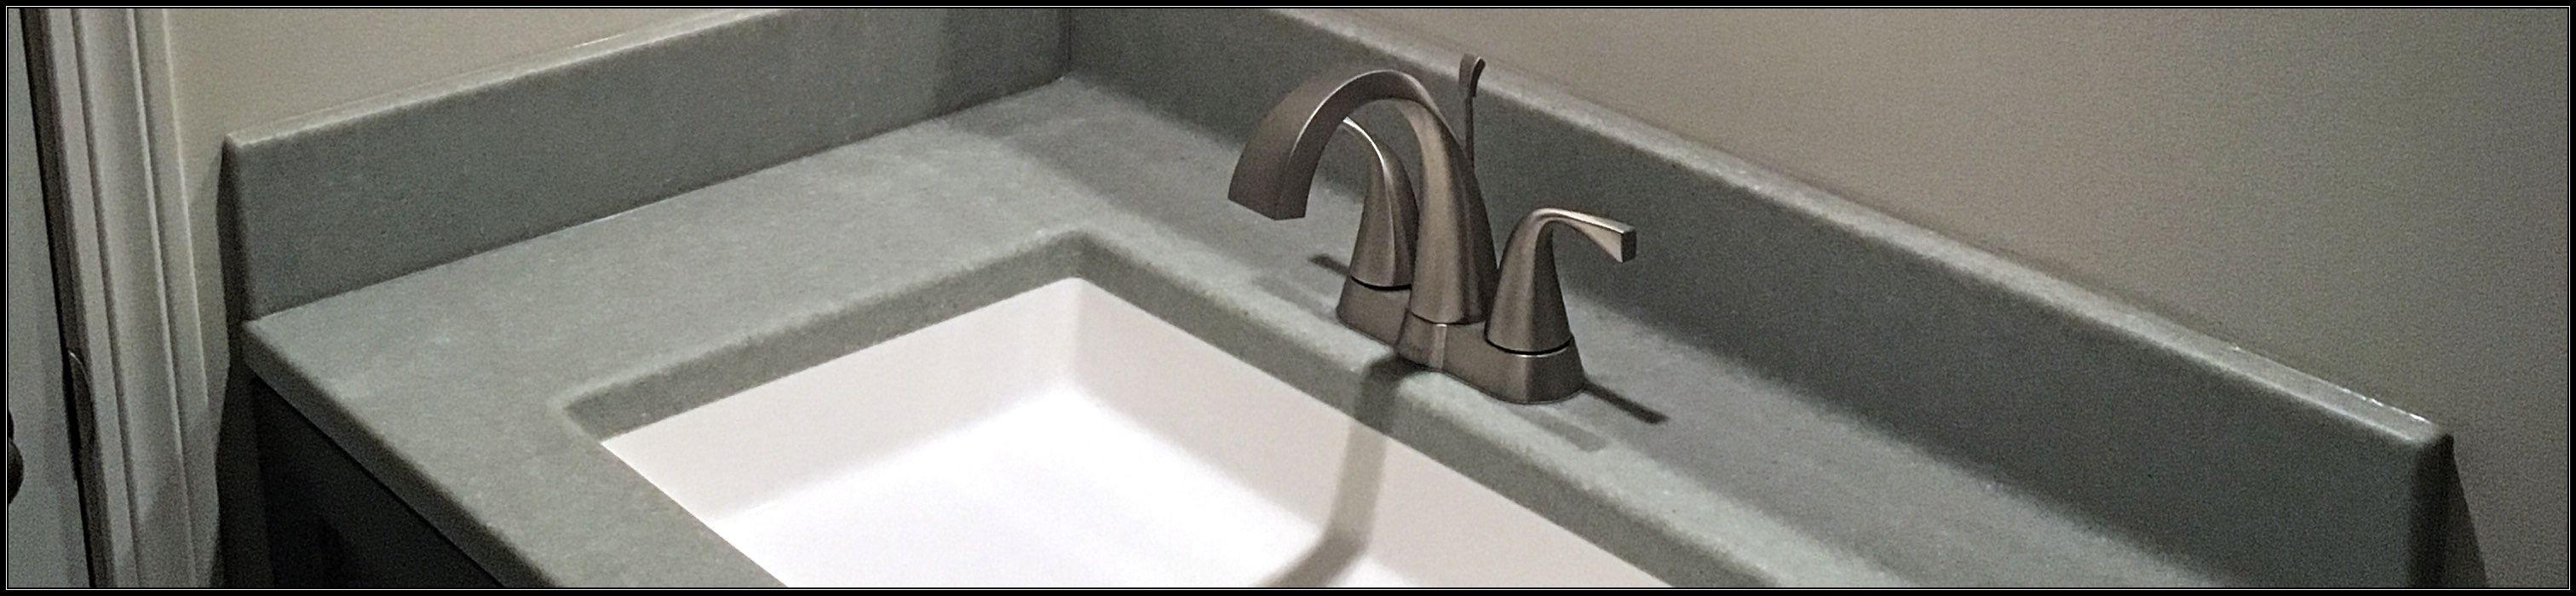 Onyx Collection Dealer Twin Cities MN. Bathroom vanity tops installed.